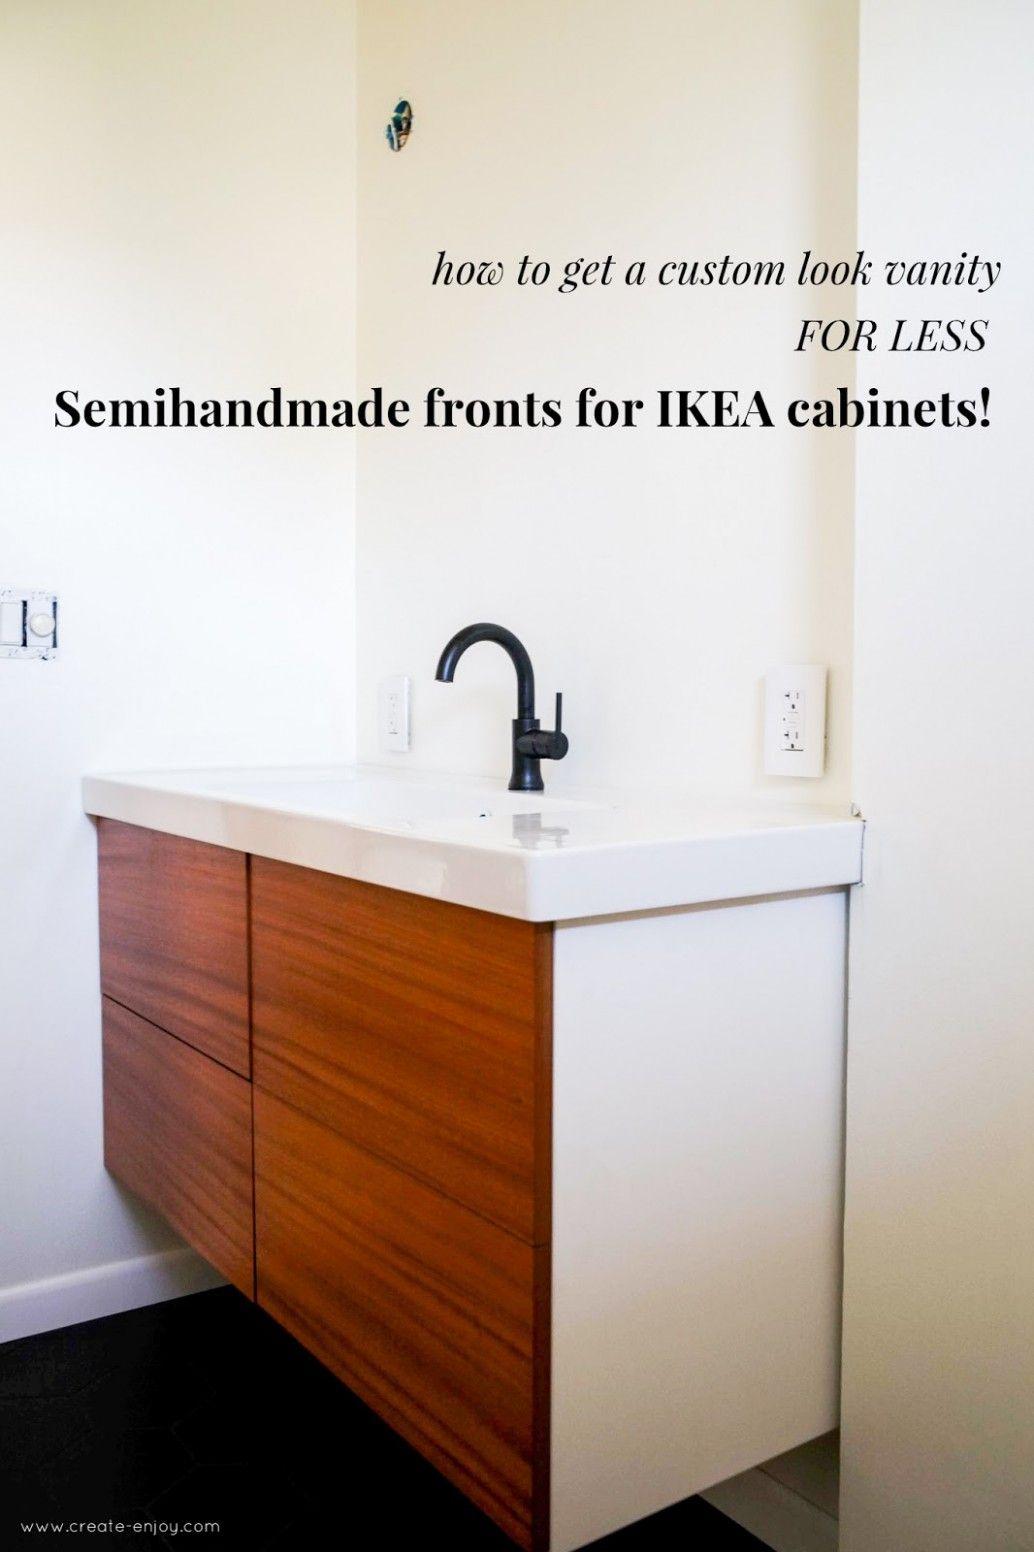 Ikea Build Your Own Bathroom Vanity in 7  Custom bathroom